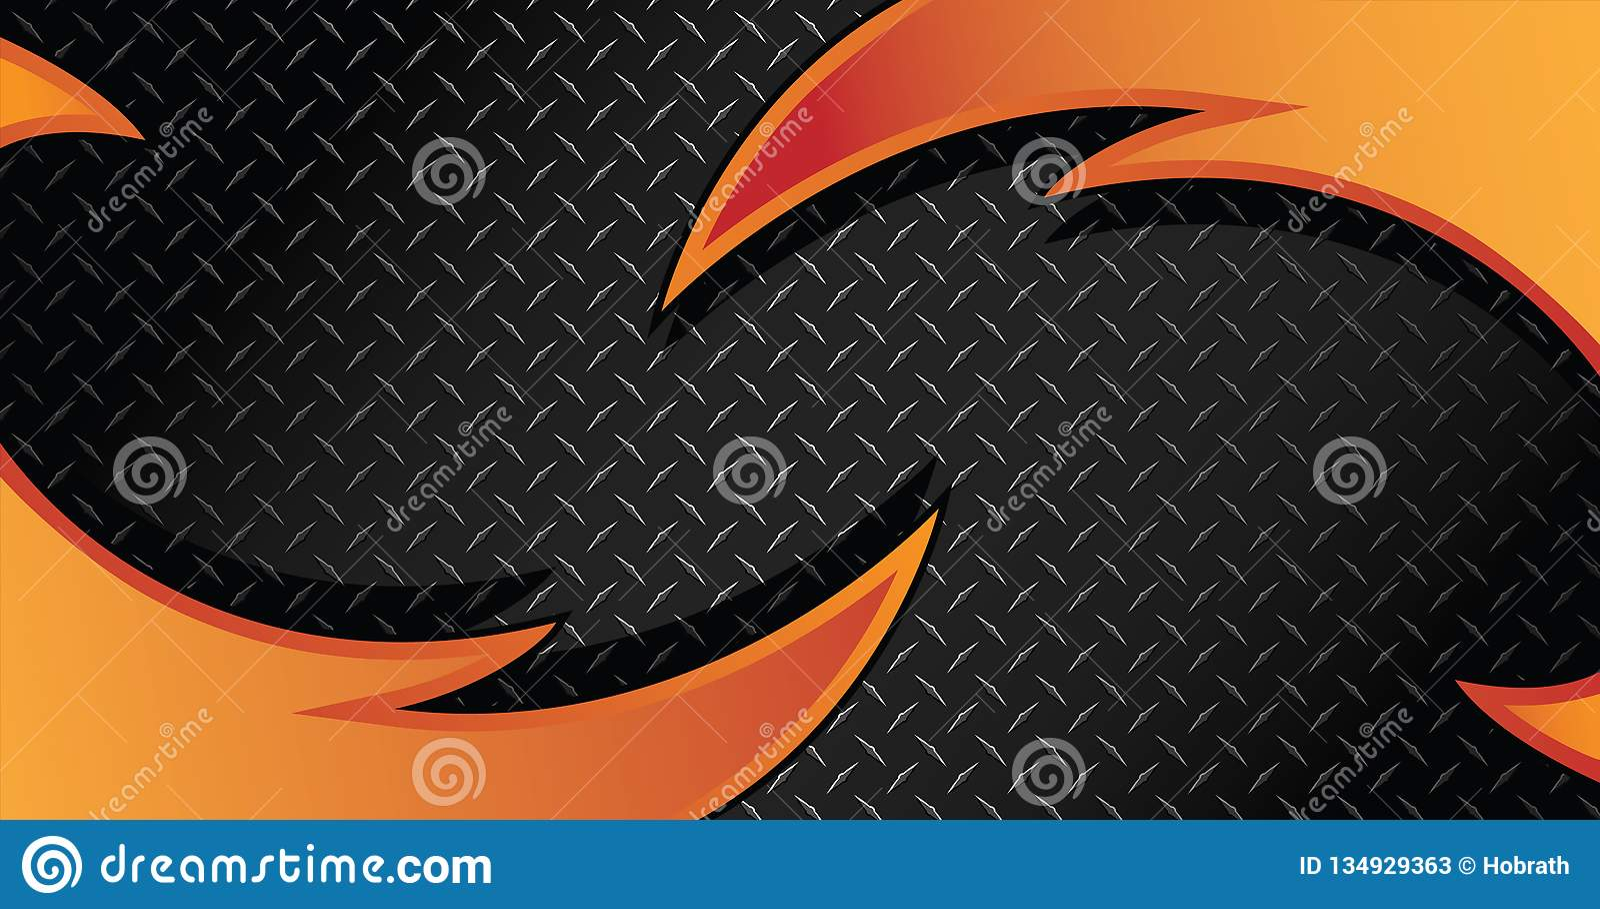 Red Orange Fire Razor Diamond Plate Textured Vector Background Illustration